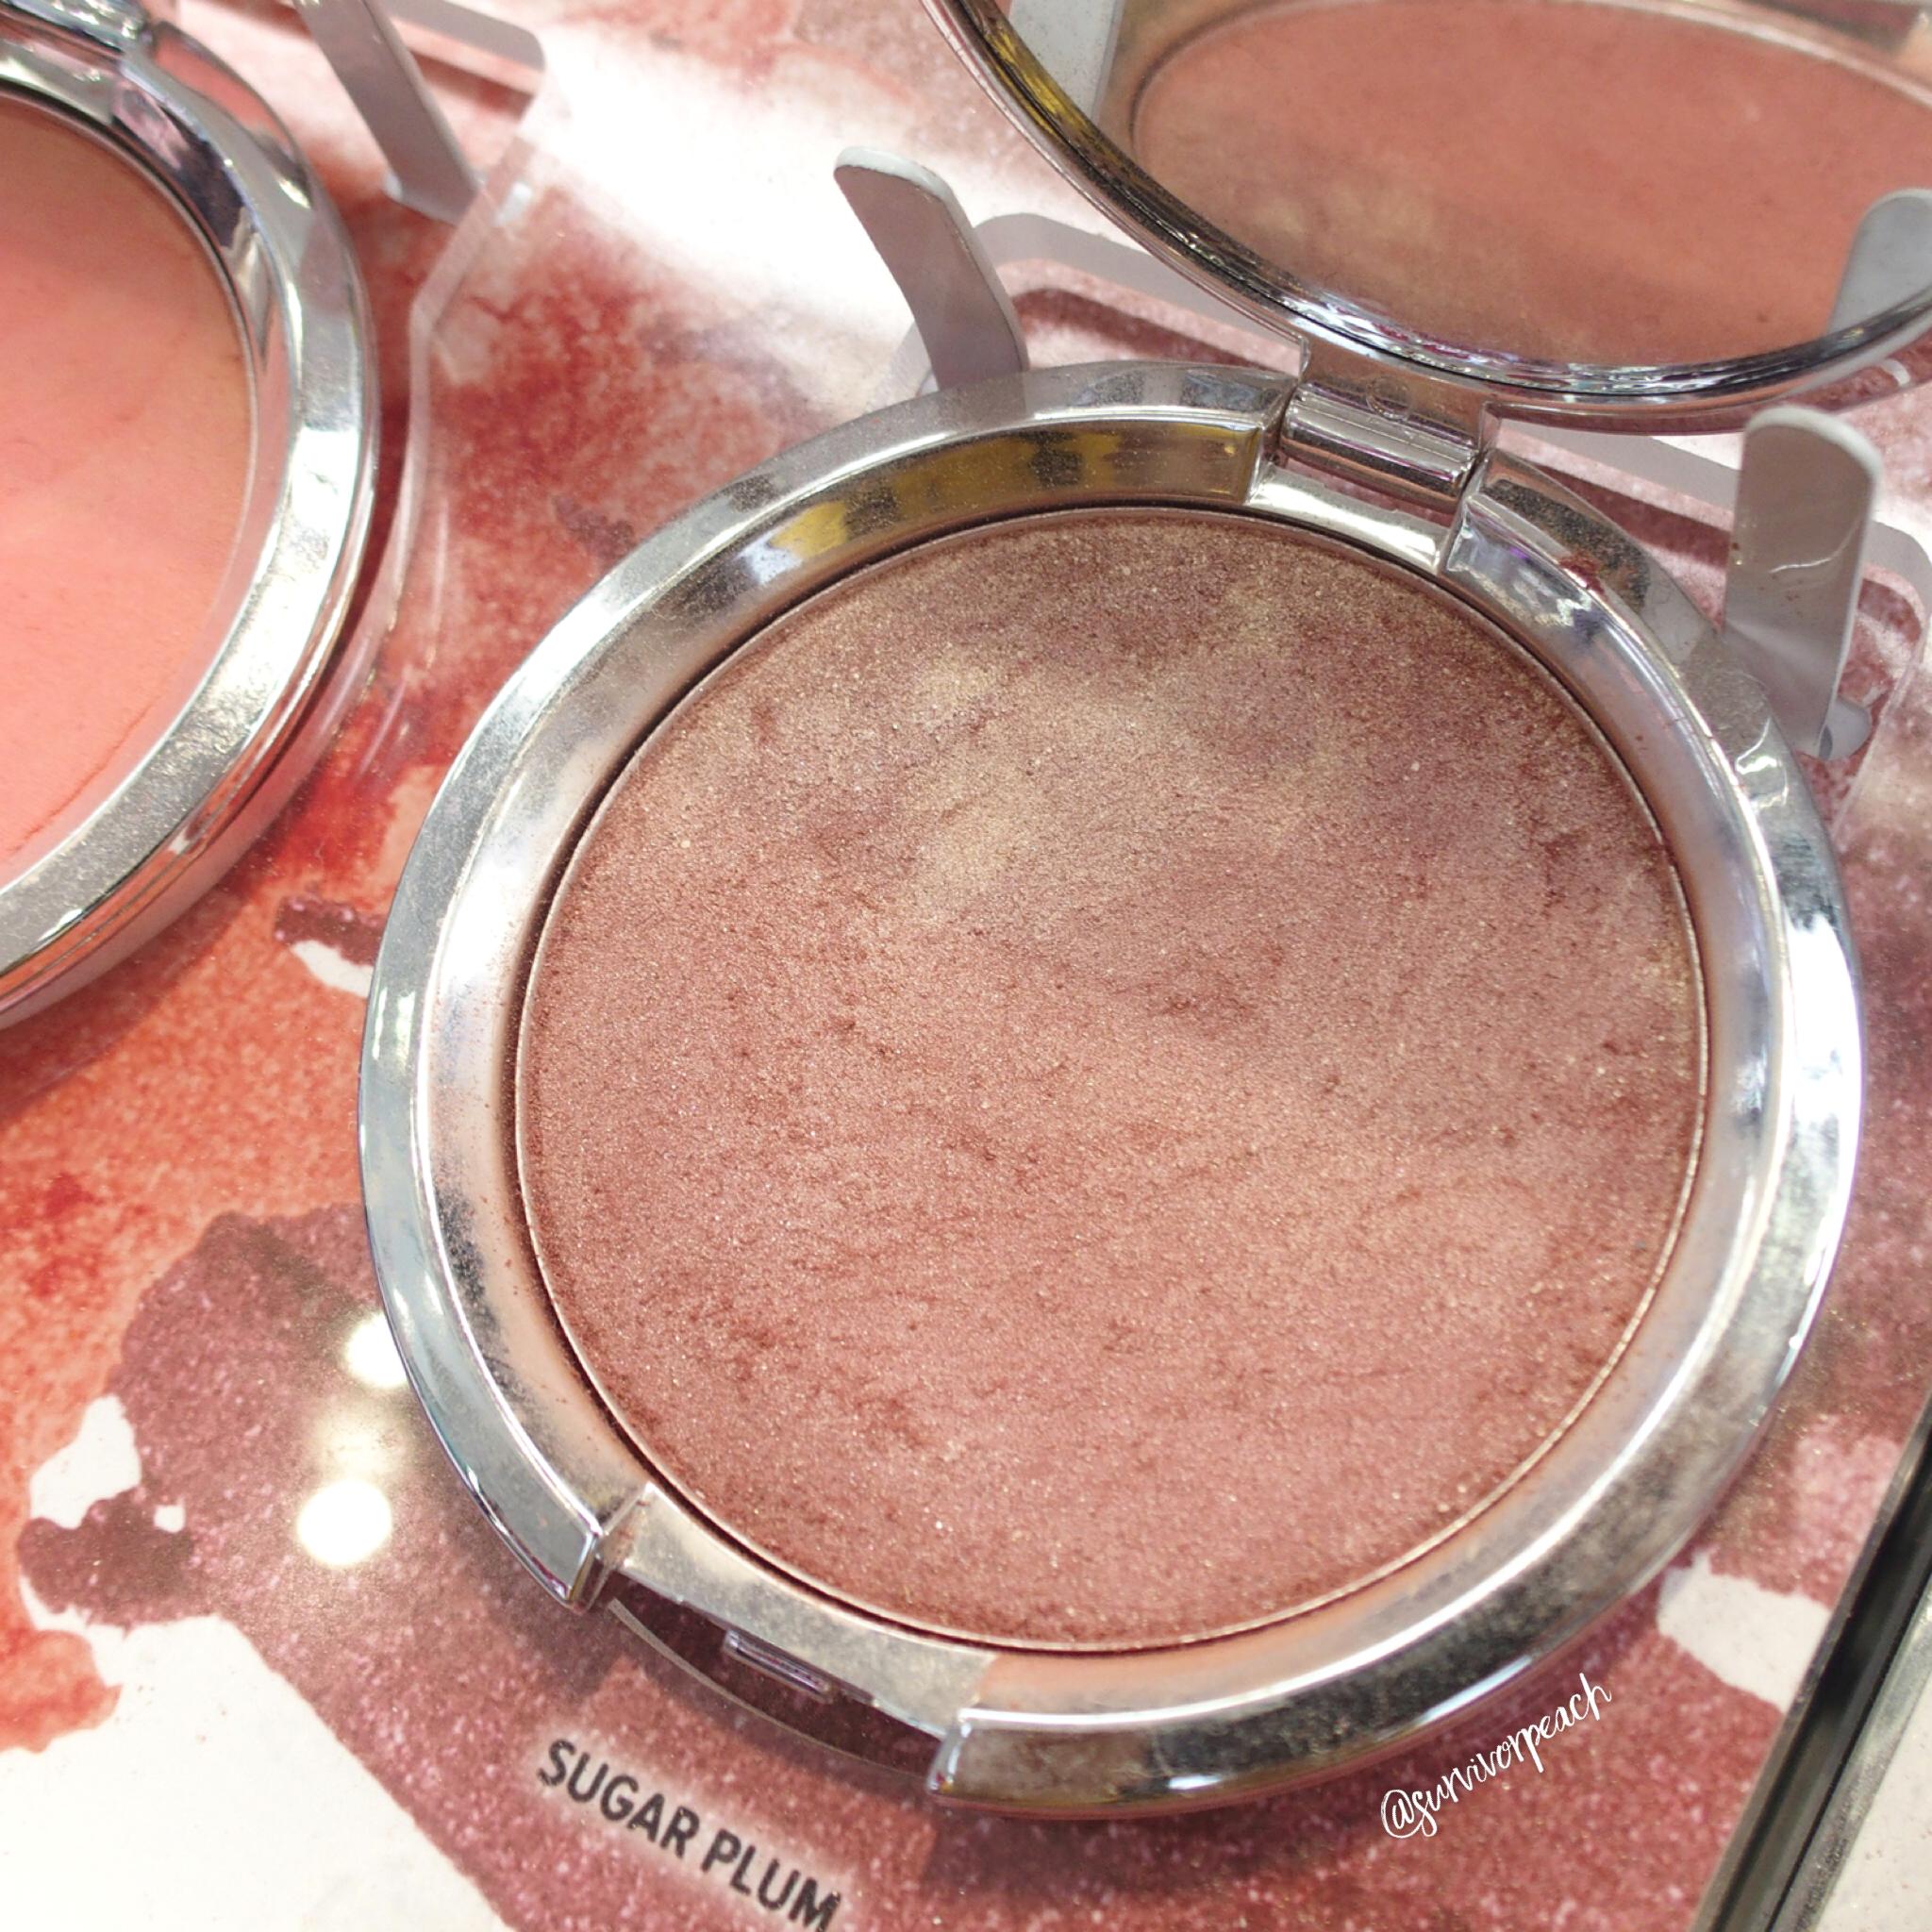 It cosmetics Ombré Radiance Blush - Sugar Plum